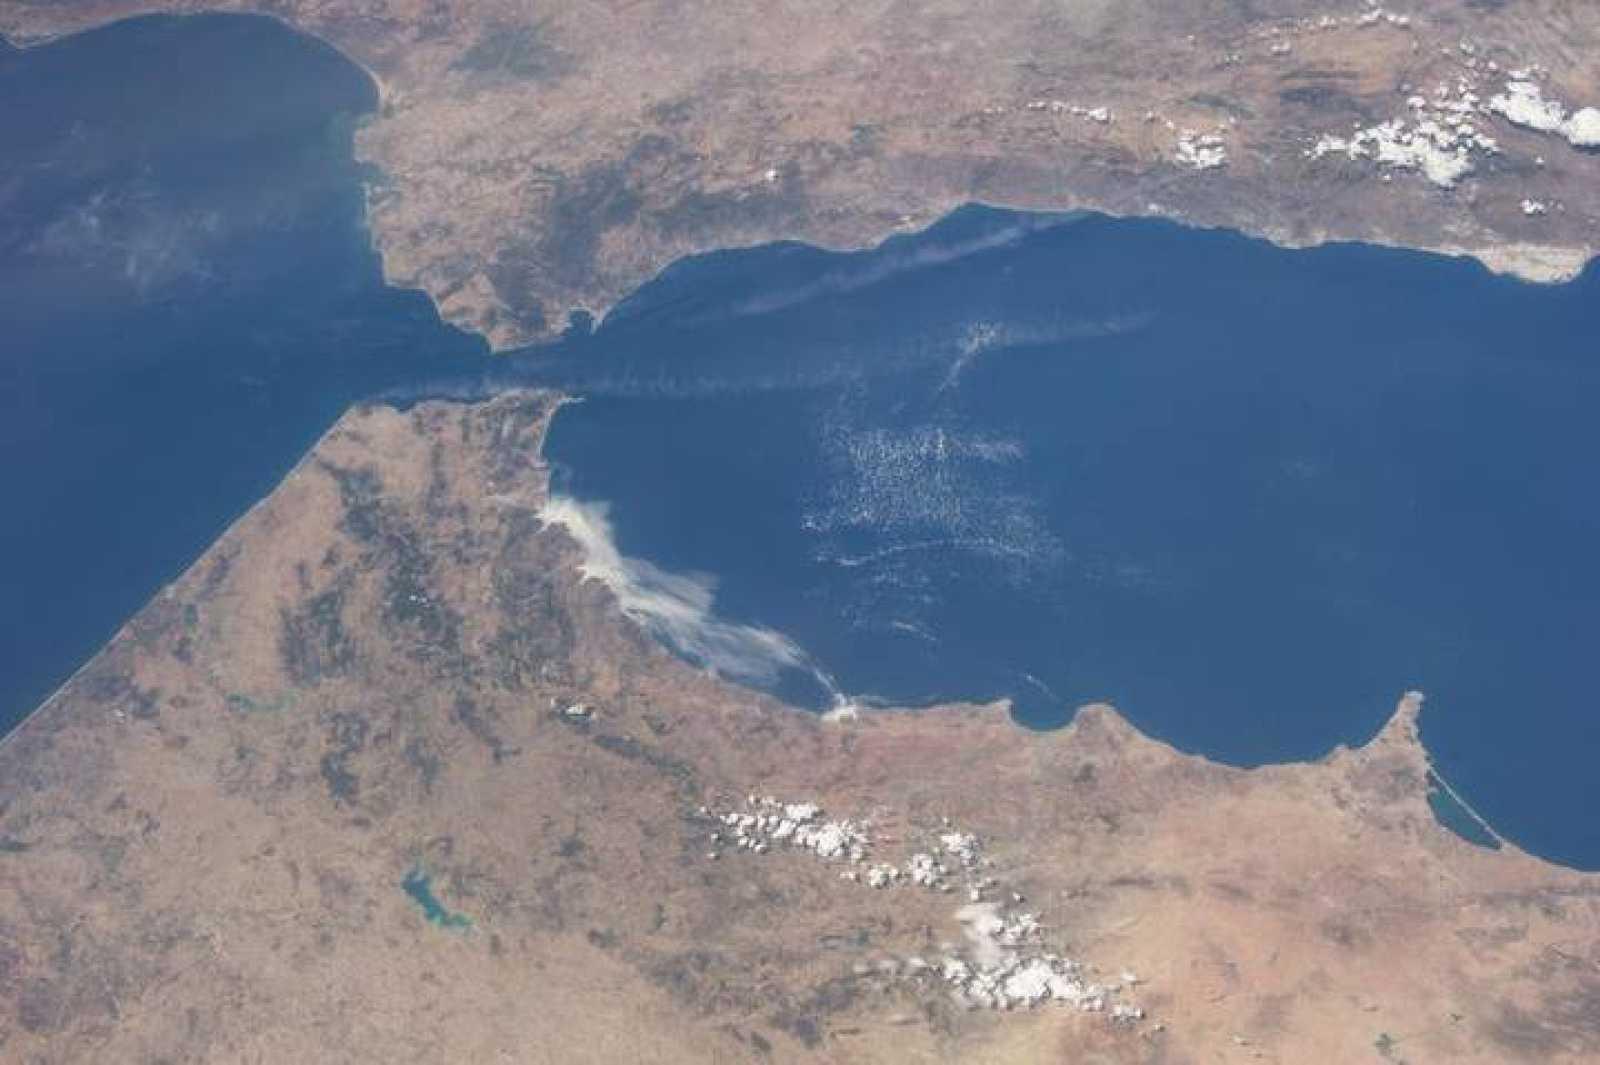 Imagen del estrecho de Gibraltar captada por un satélite.